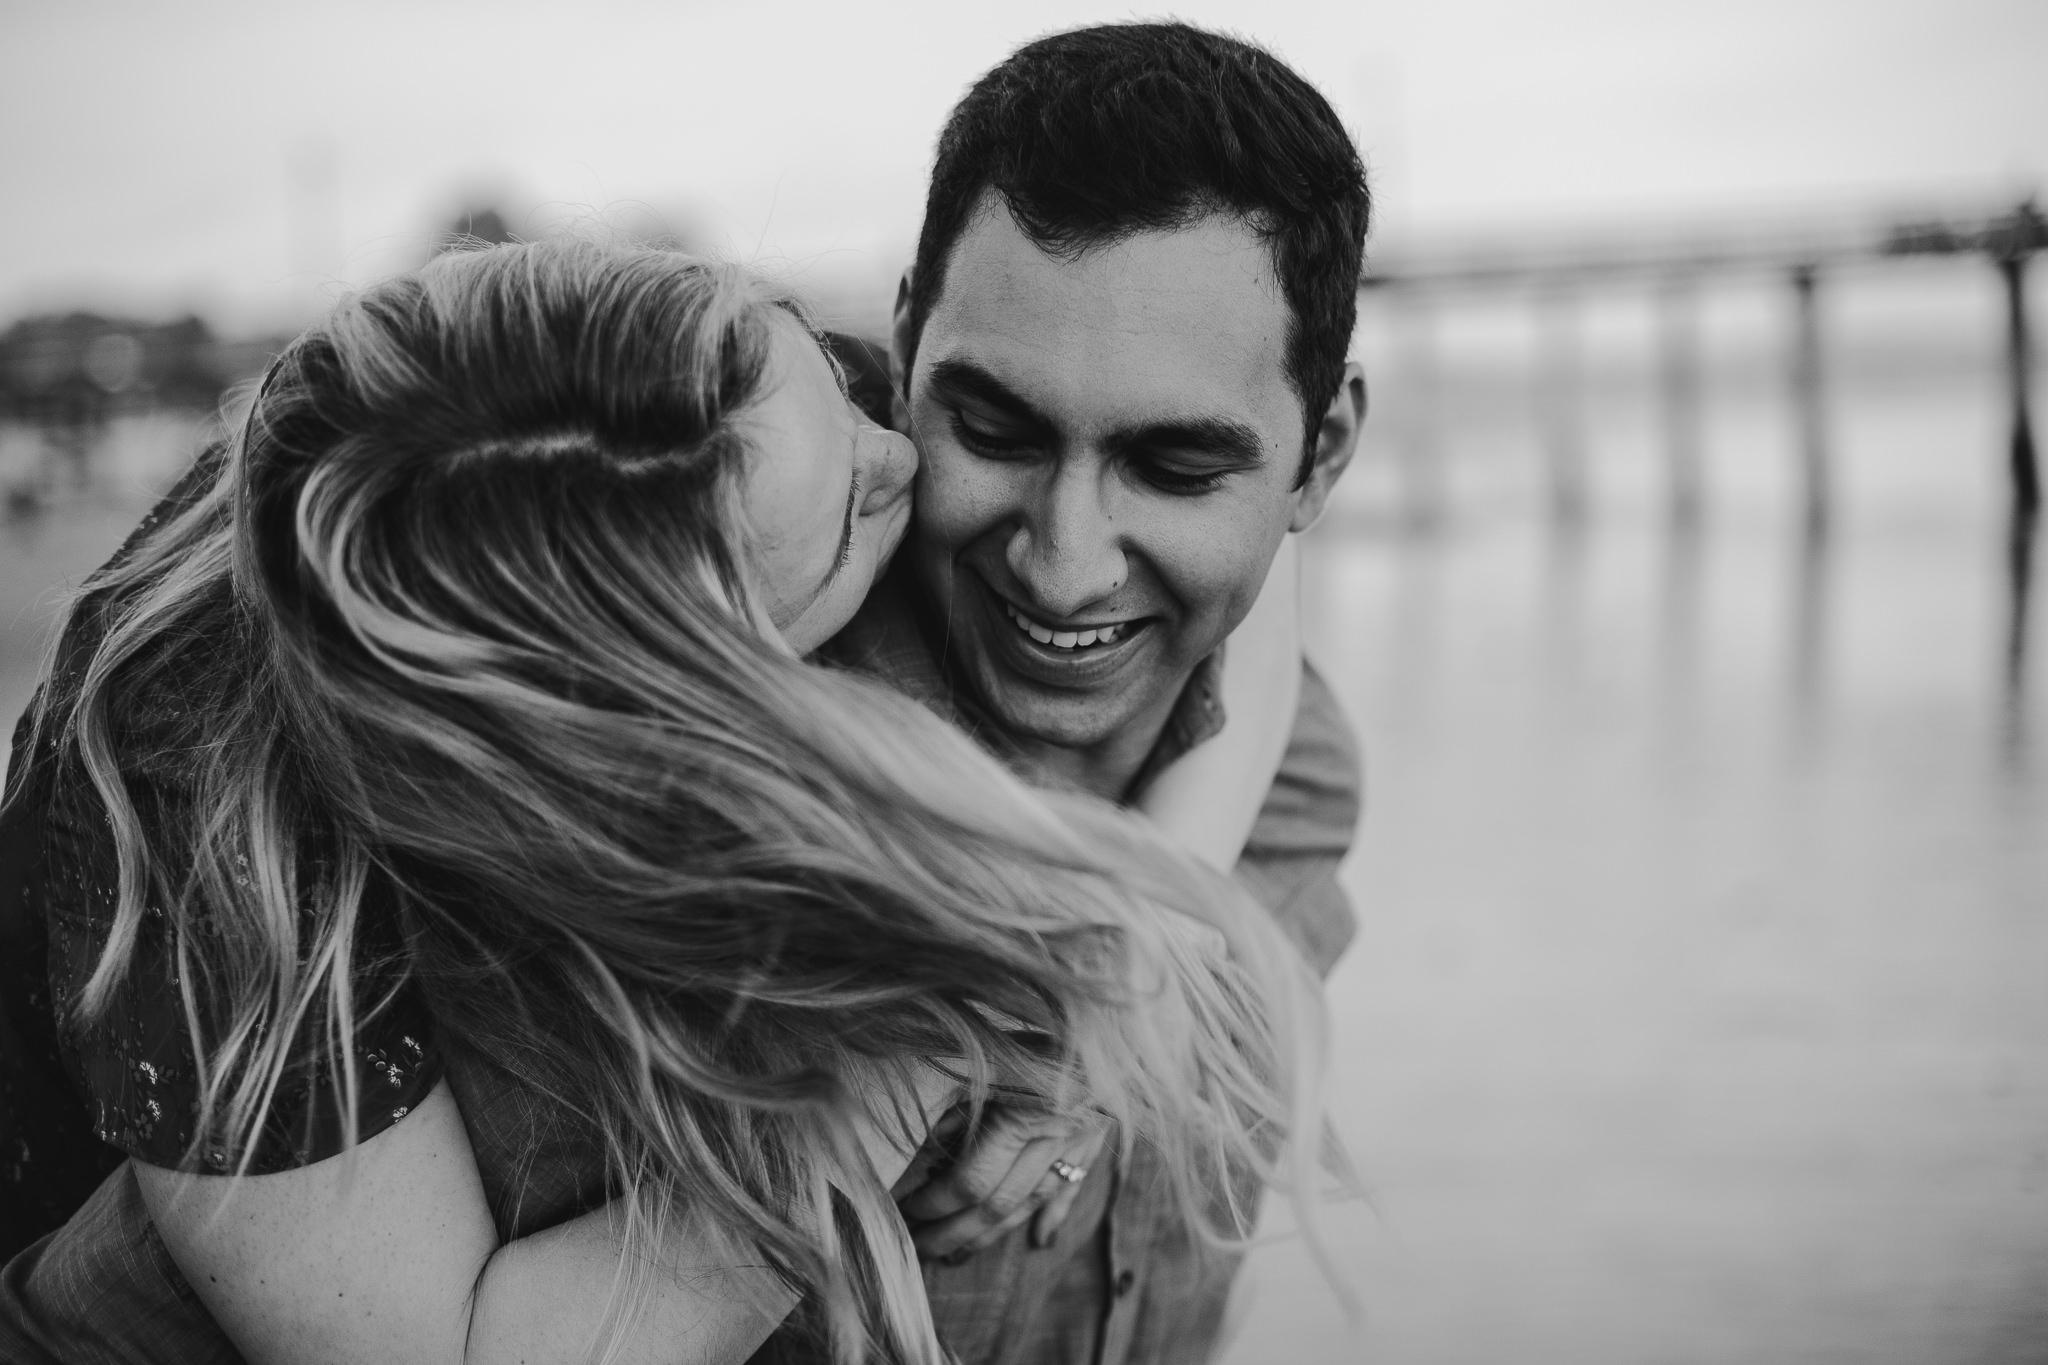 Archer Inspired Photography Capitola Beach Santa Cruz Wedding Engagement Lifestyle Session Photographer-149.jpg